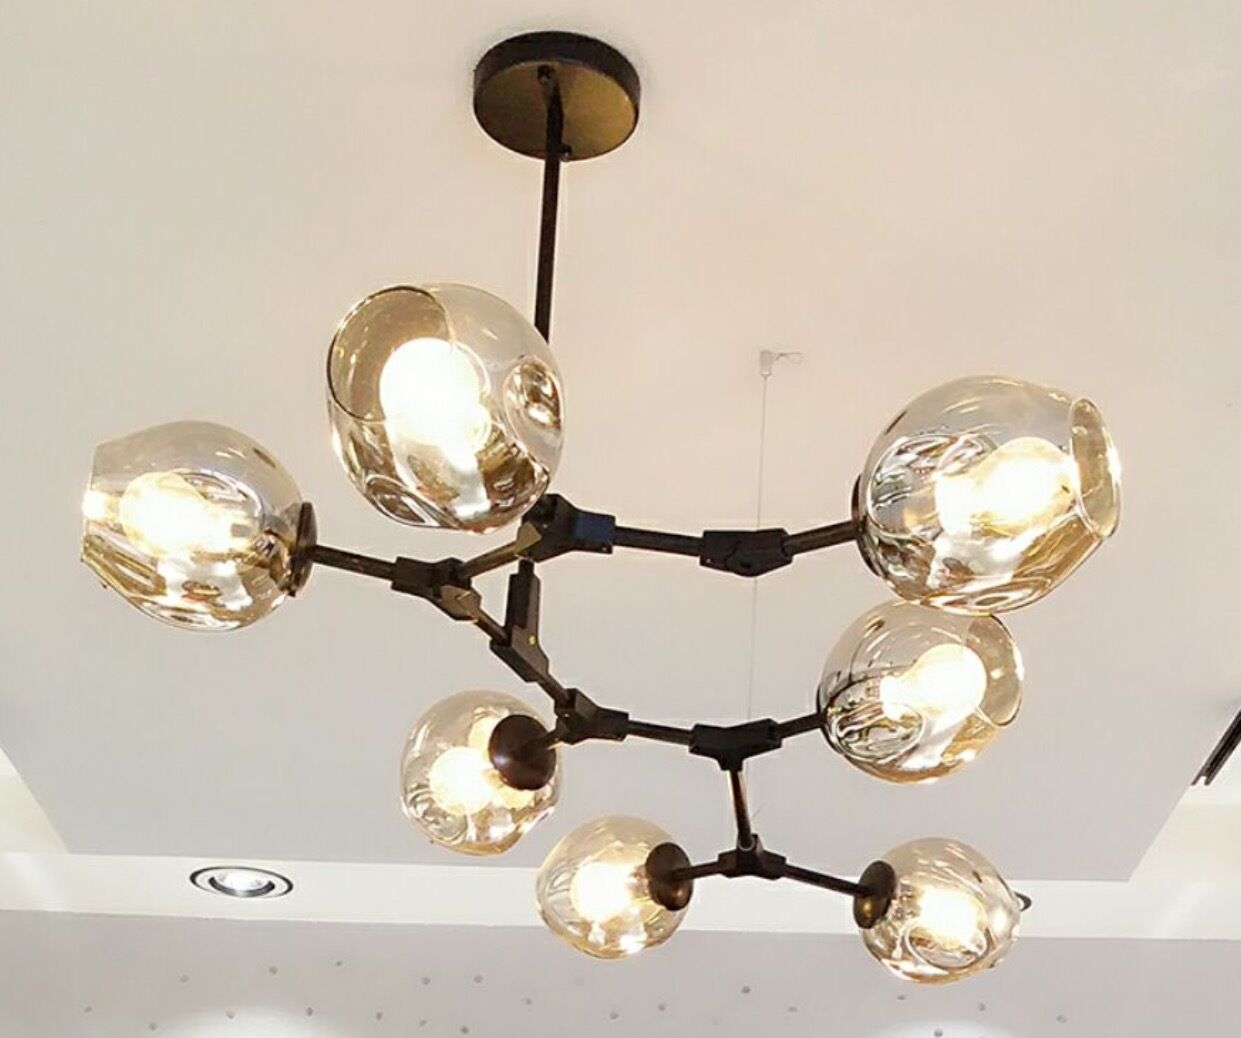 9 5 Branch Chandelier Glass 3 7 11 Globes Pendant Lamp Adjustable Joints 8